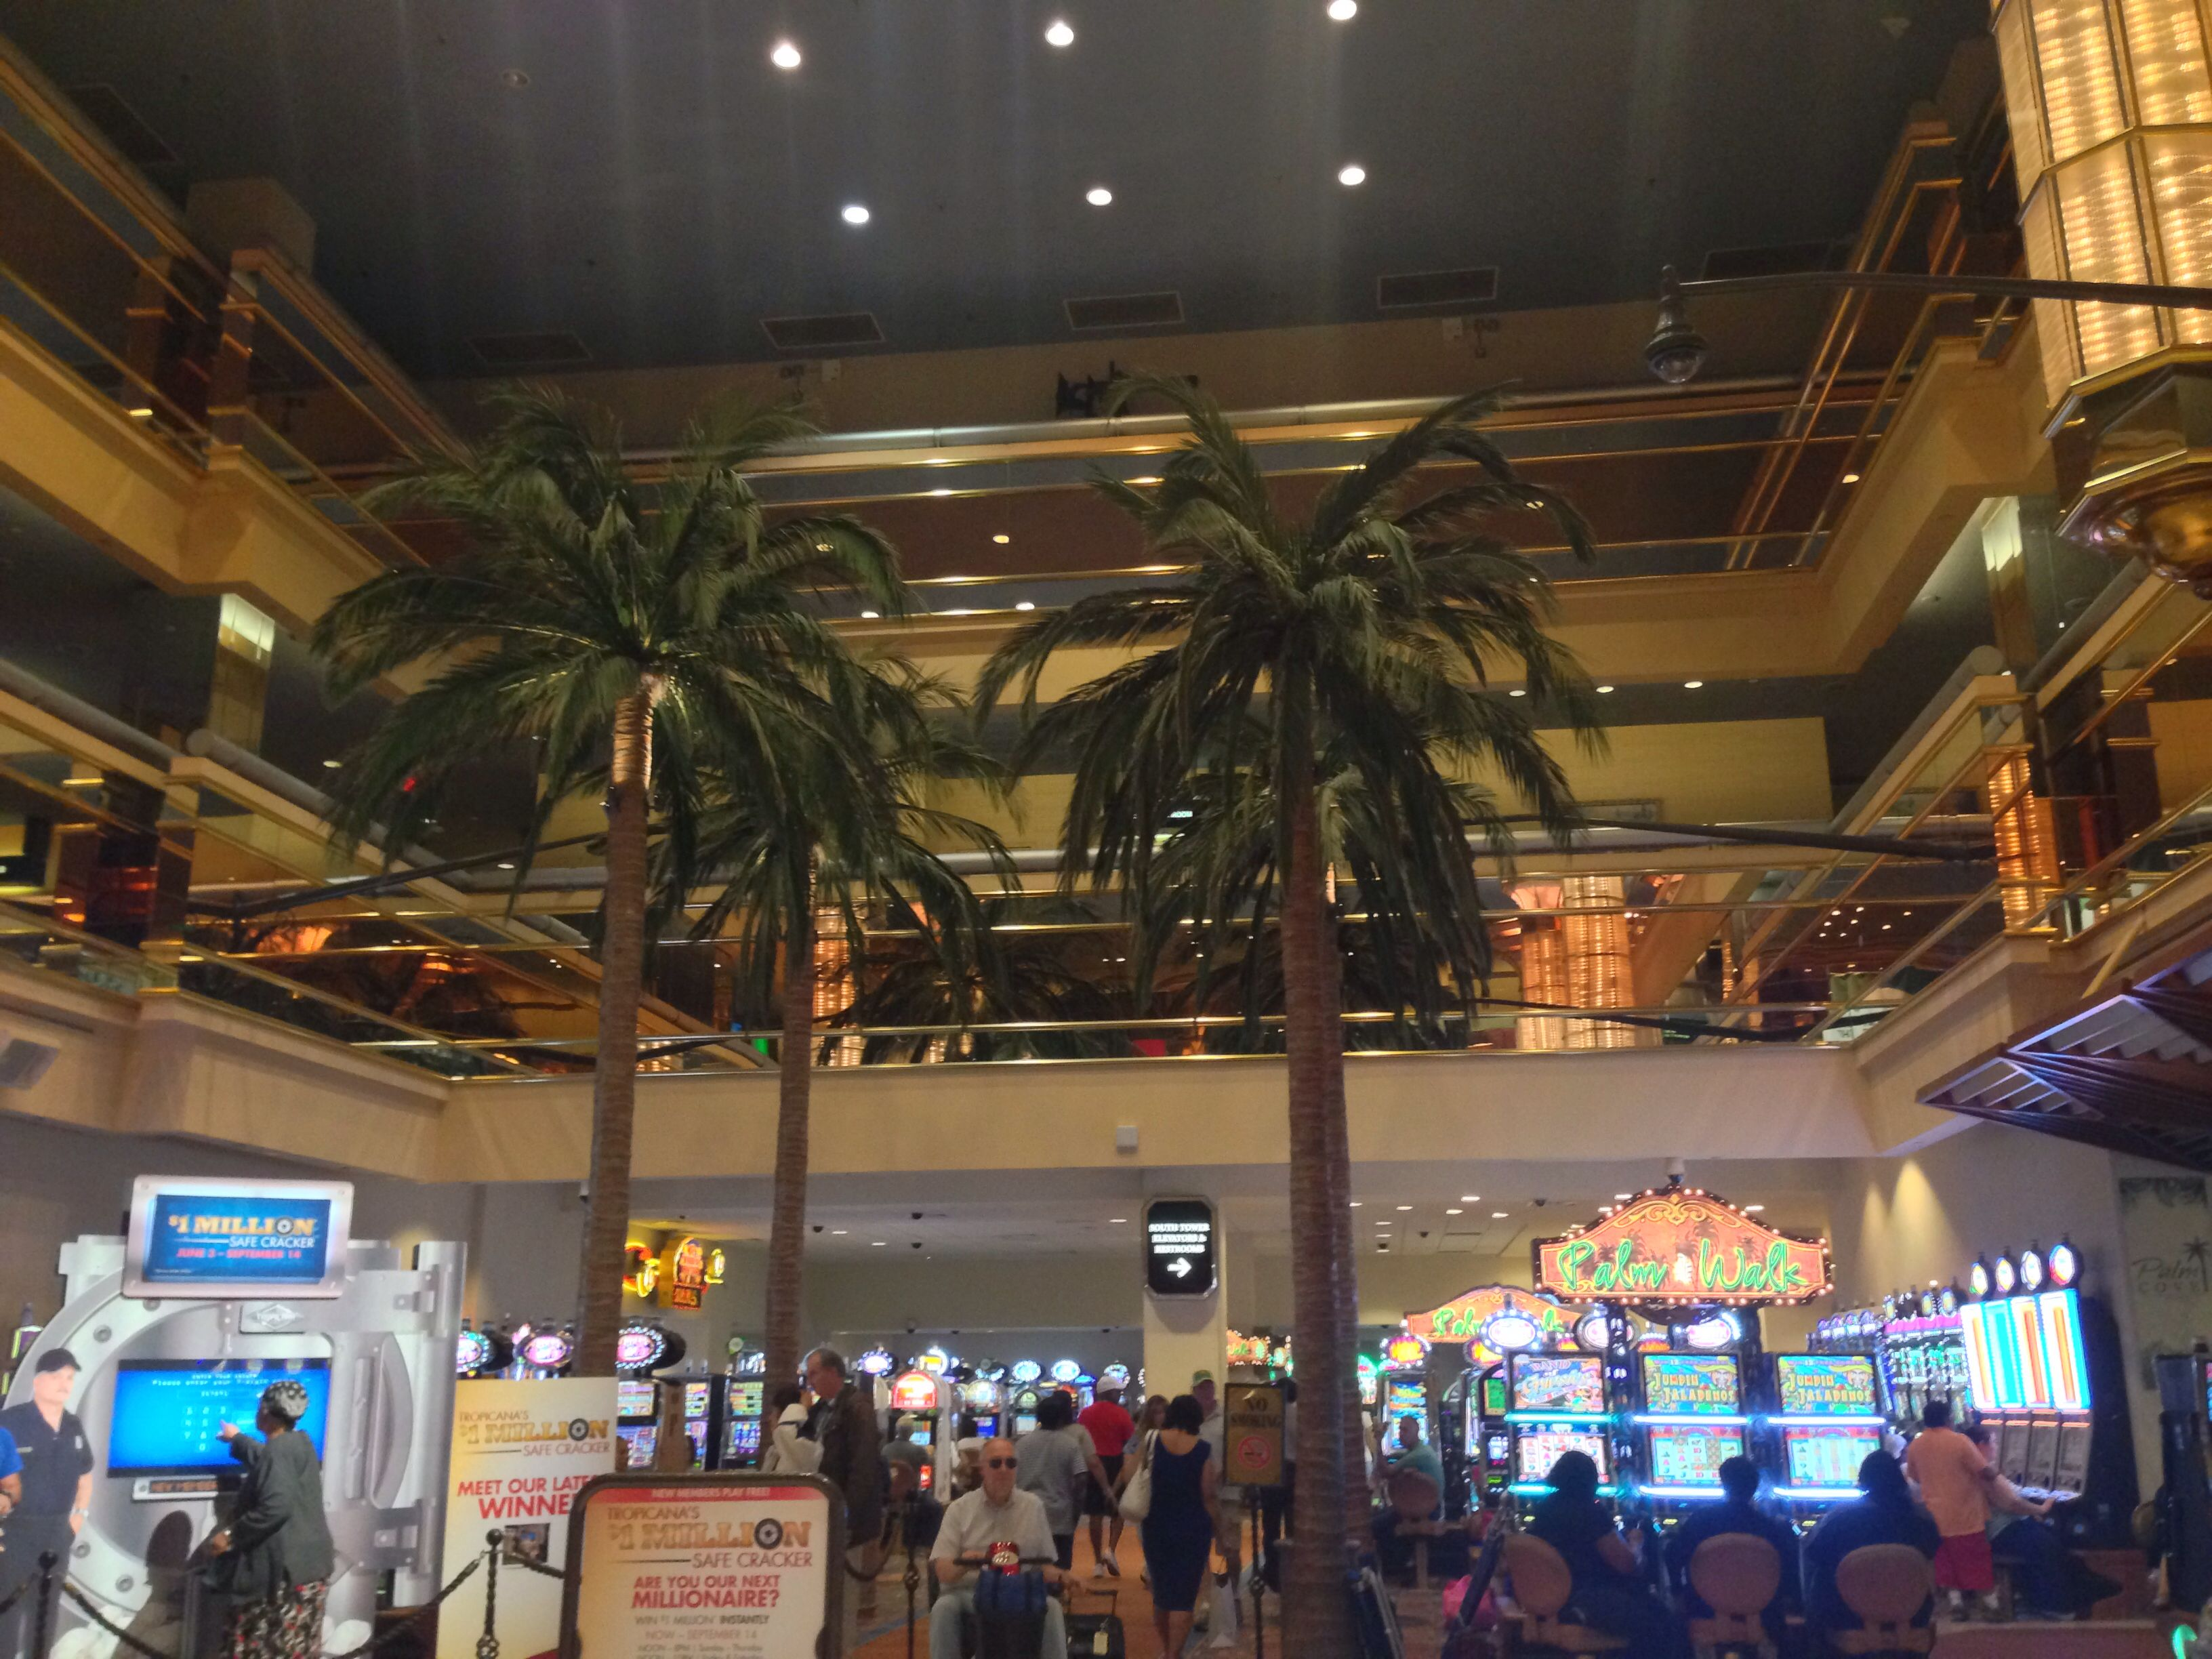 Inside the Tropicana Casino in Atlantic City, New Jersey